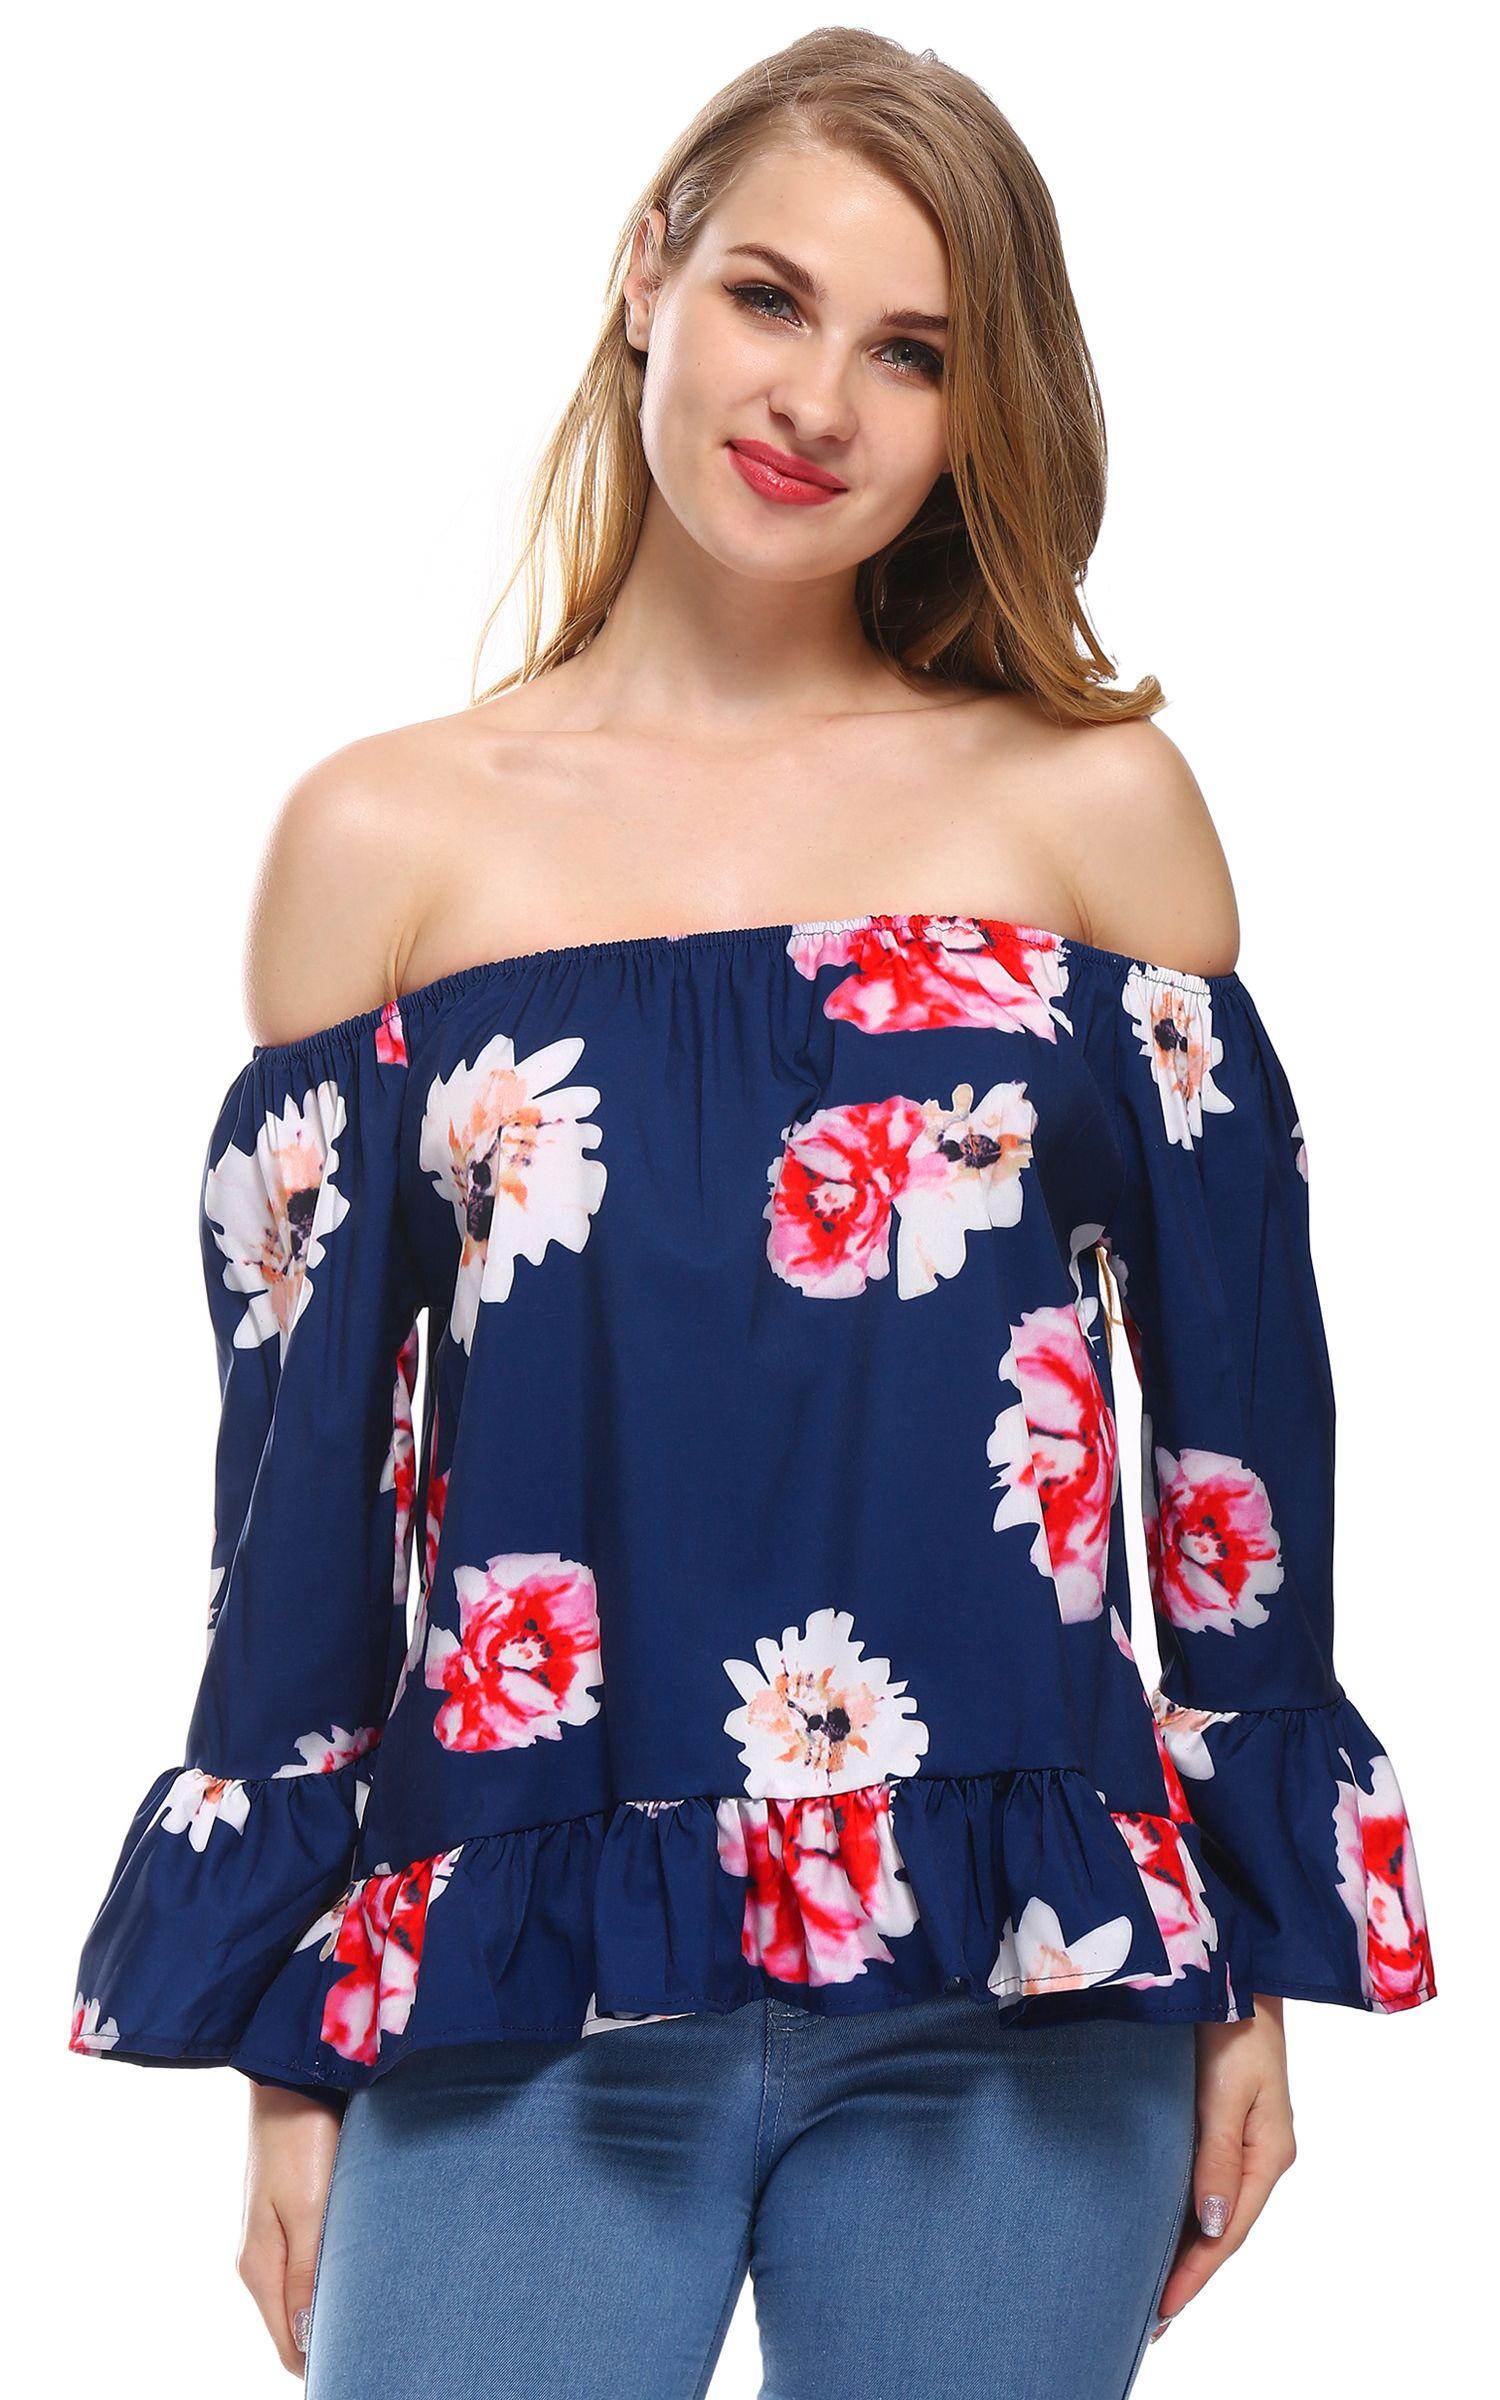 c9f78030b75f1 Sexy Women Chiffon Floral Print T Shirt Tops Slash Neck Off The Shoulder  Casual Beach Blusas Plus Size Women Clothes L3  Affiliate